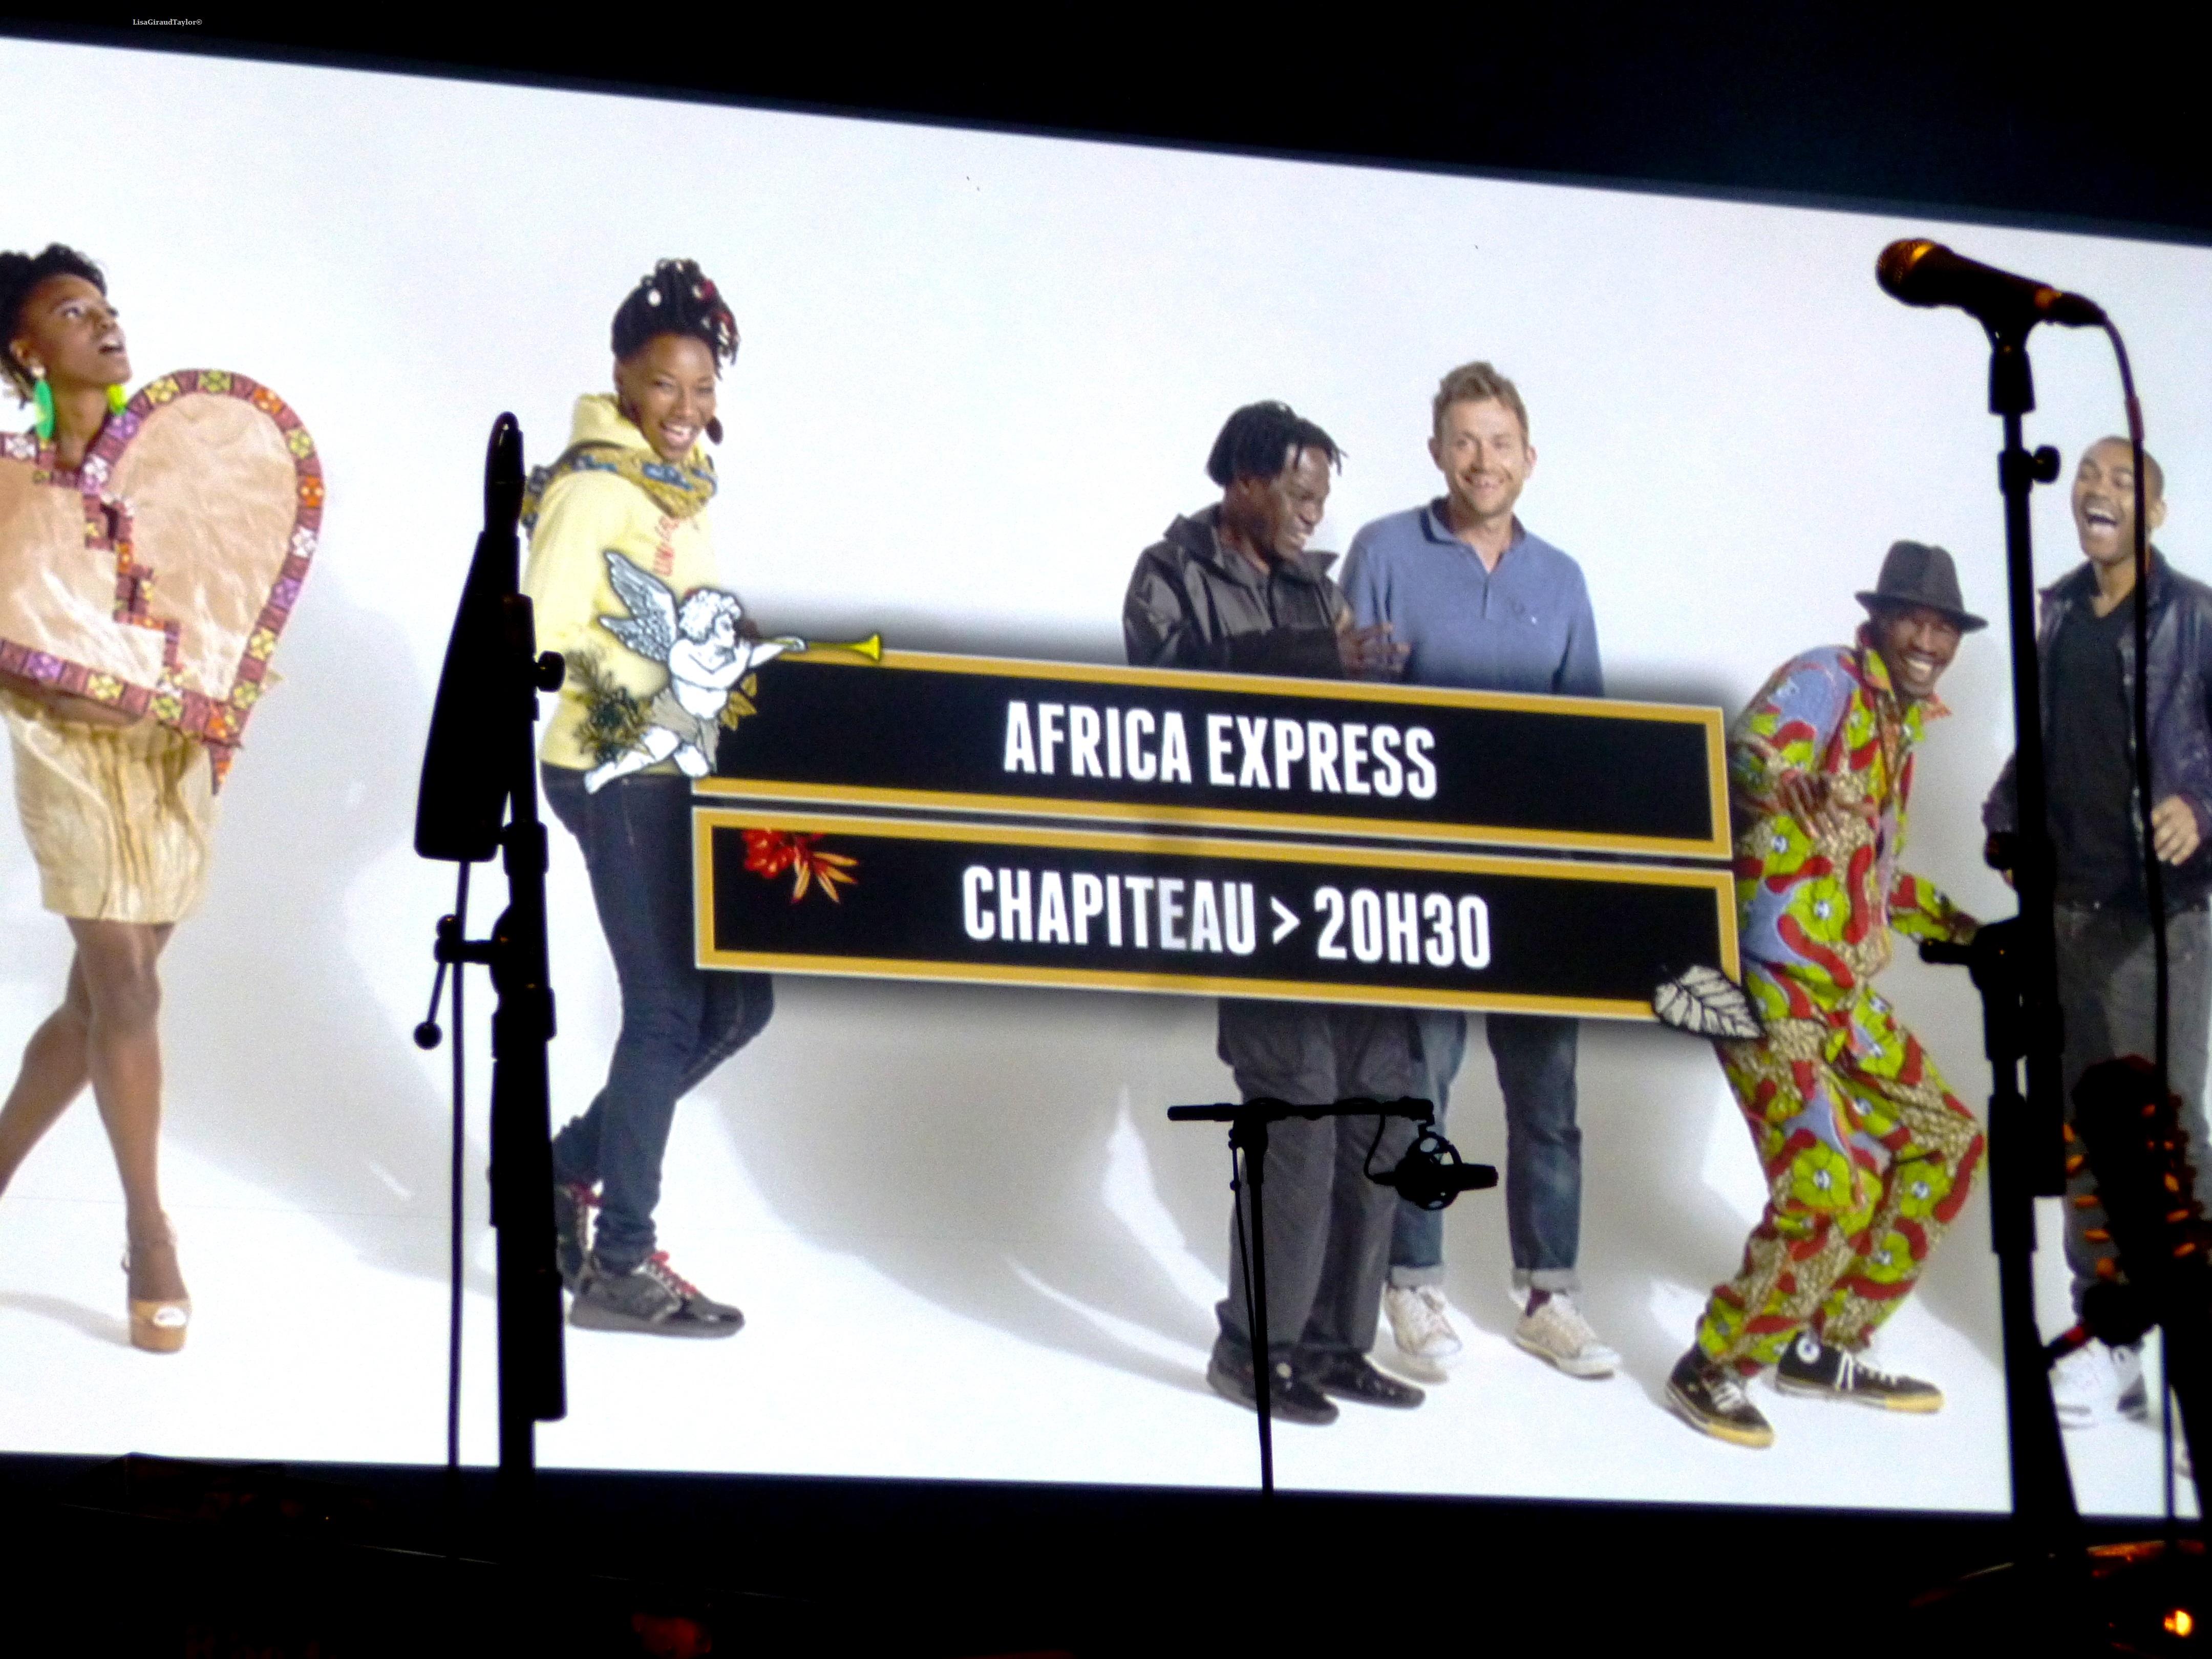 africaexpr Africa Express   Fiesta des Suds